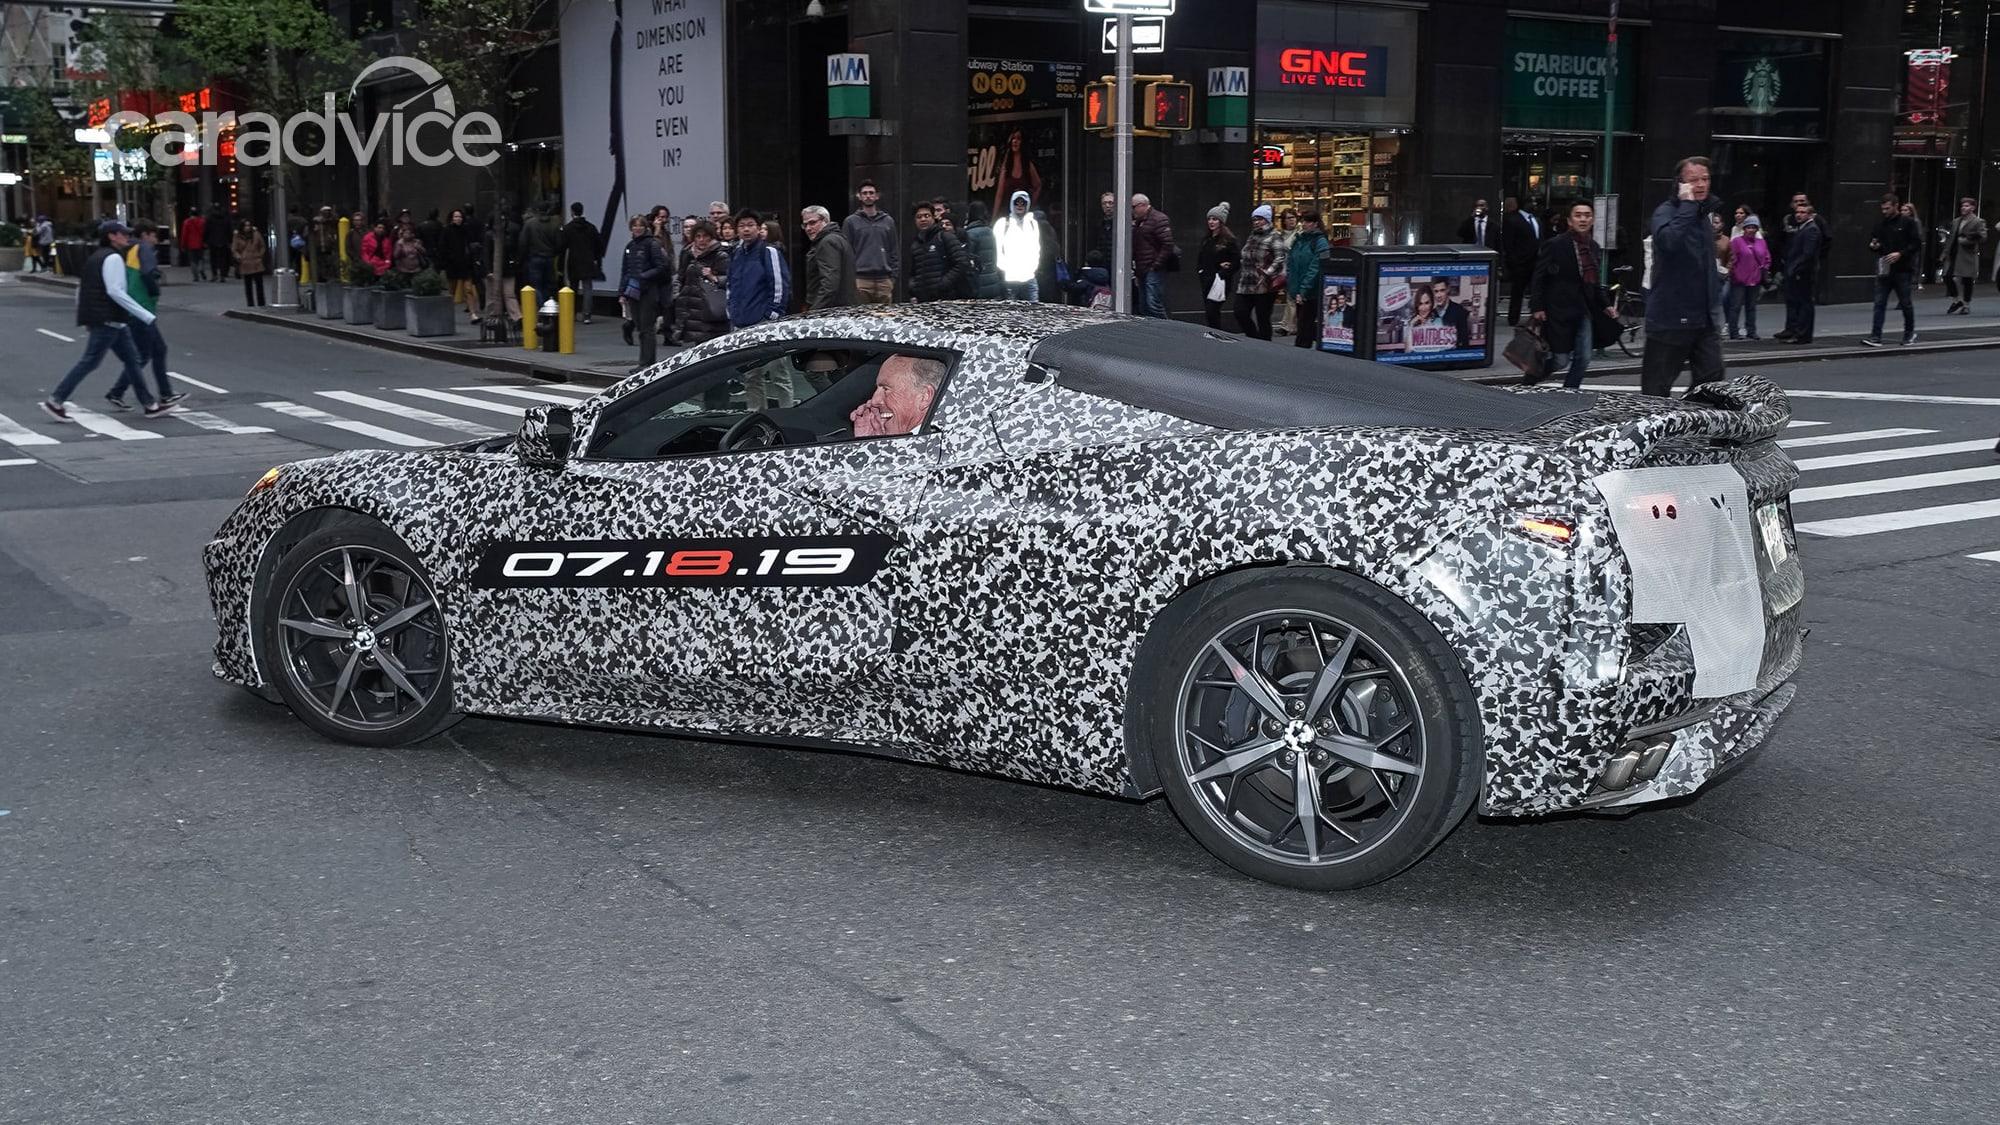 2019 - [Chevrolet] Corvette C8 Stingray - Page 4 O52rhotwq0kumacusdsr